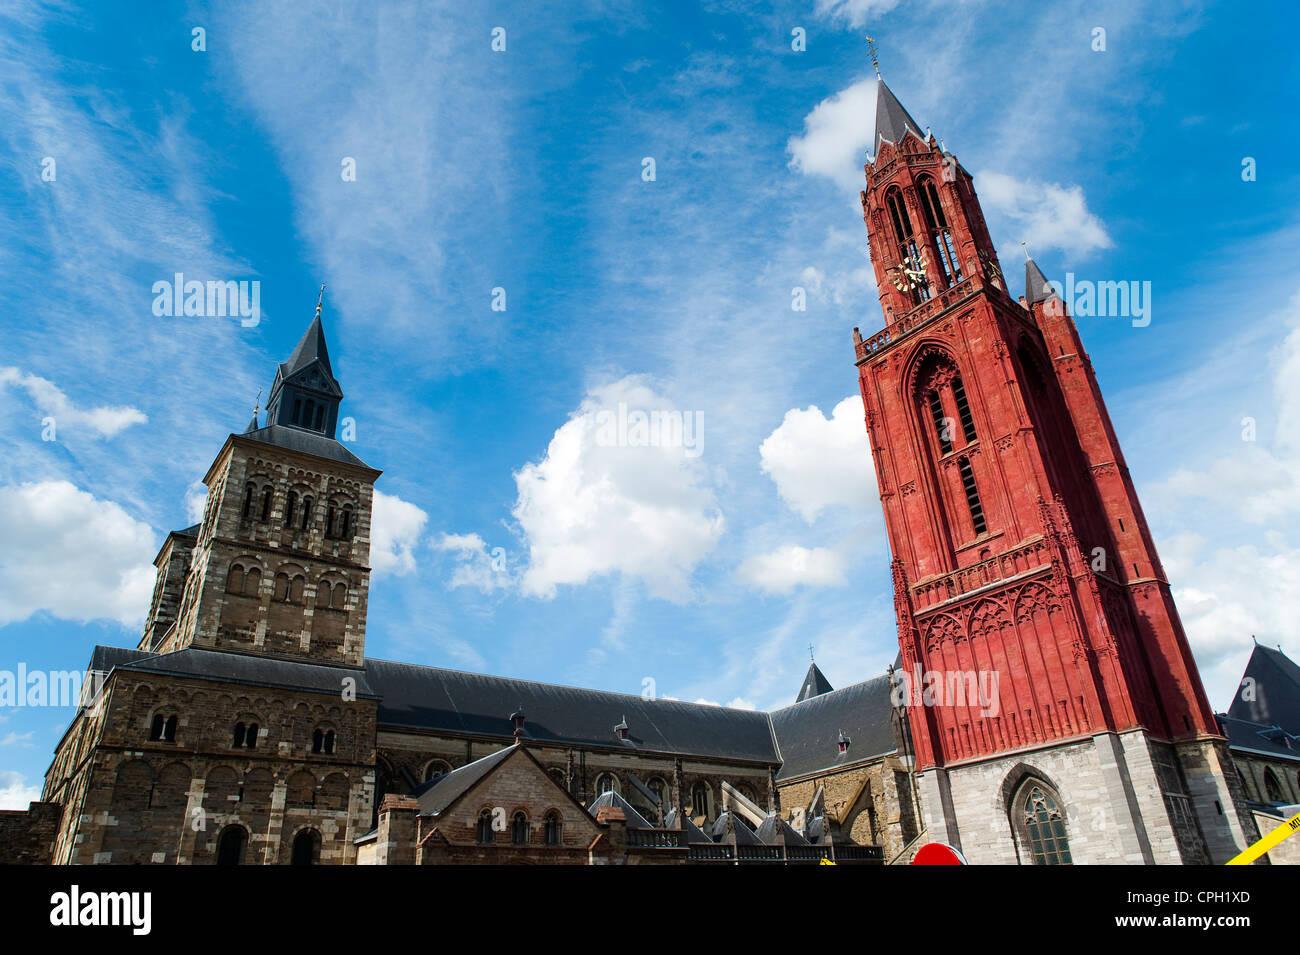 Saint servatius and st john churches maastricht the netherlands stock photo royalty free - Maastricht mobel ...